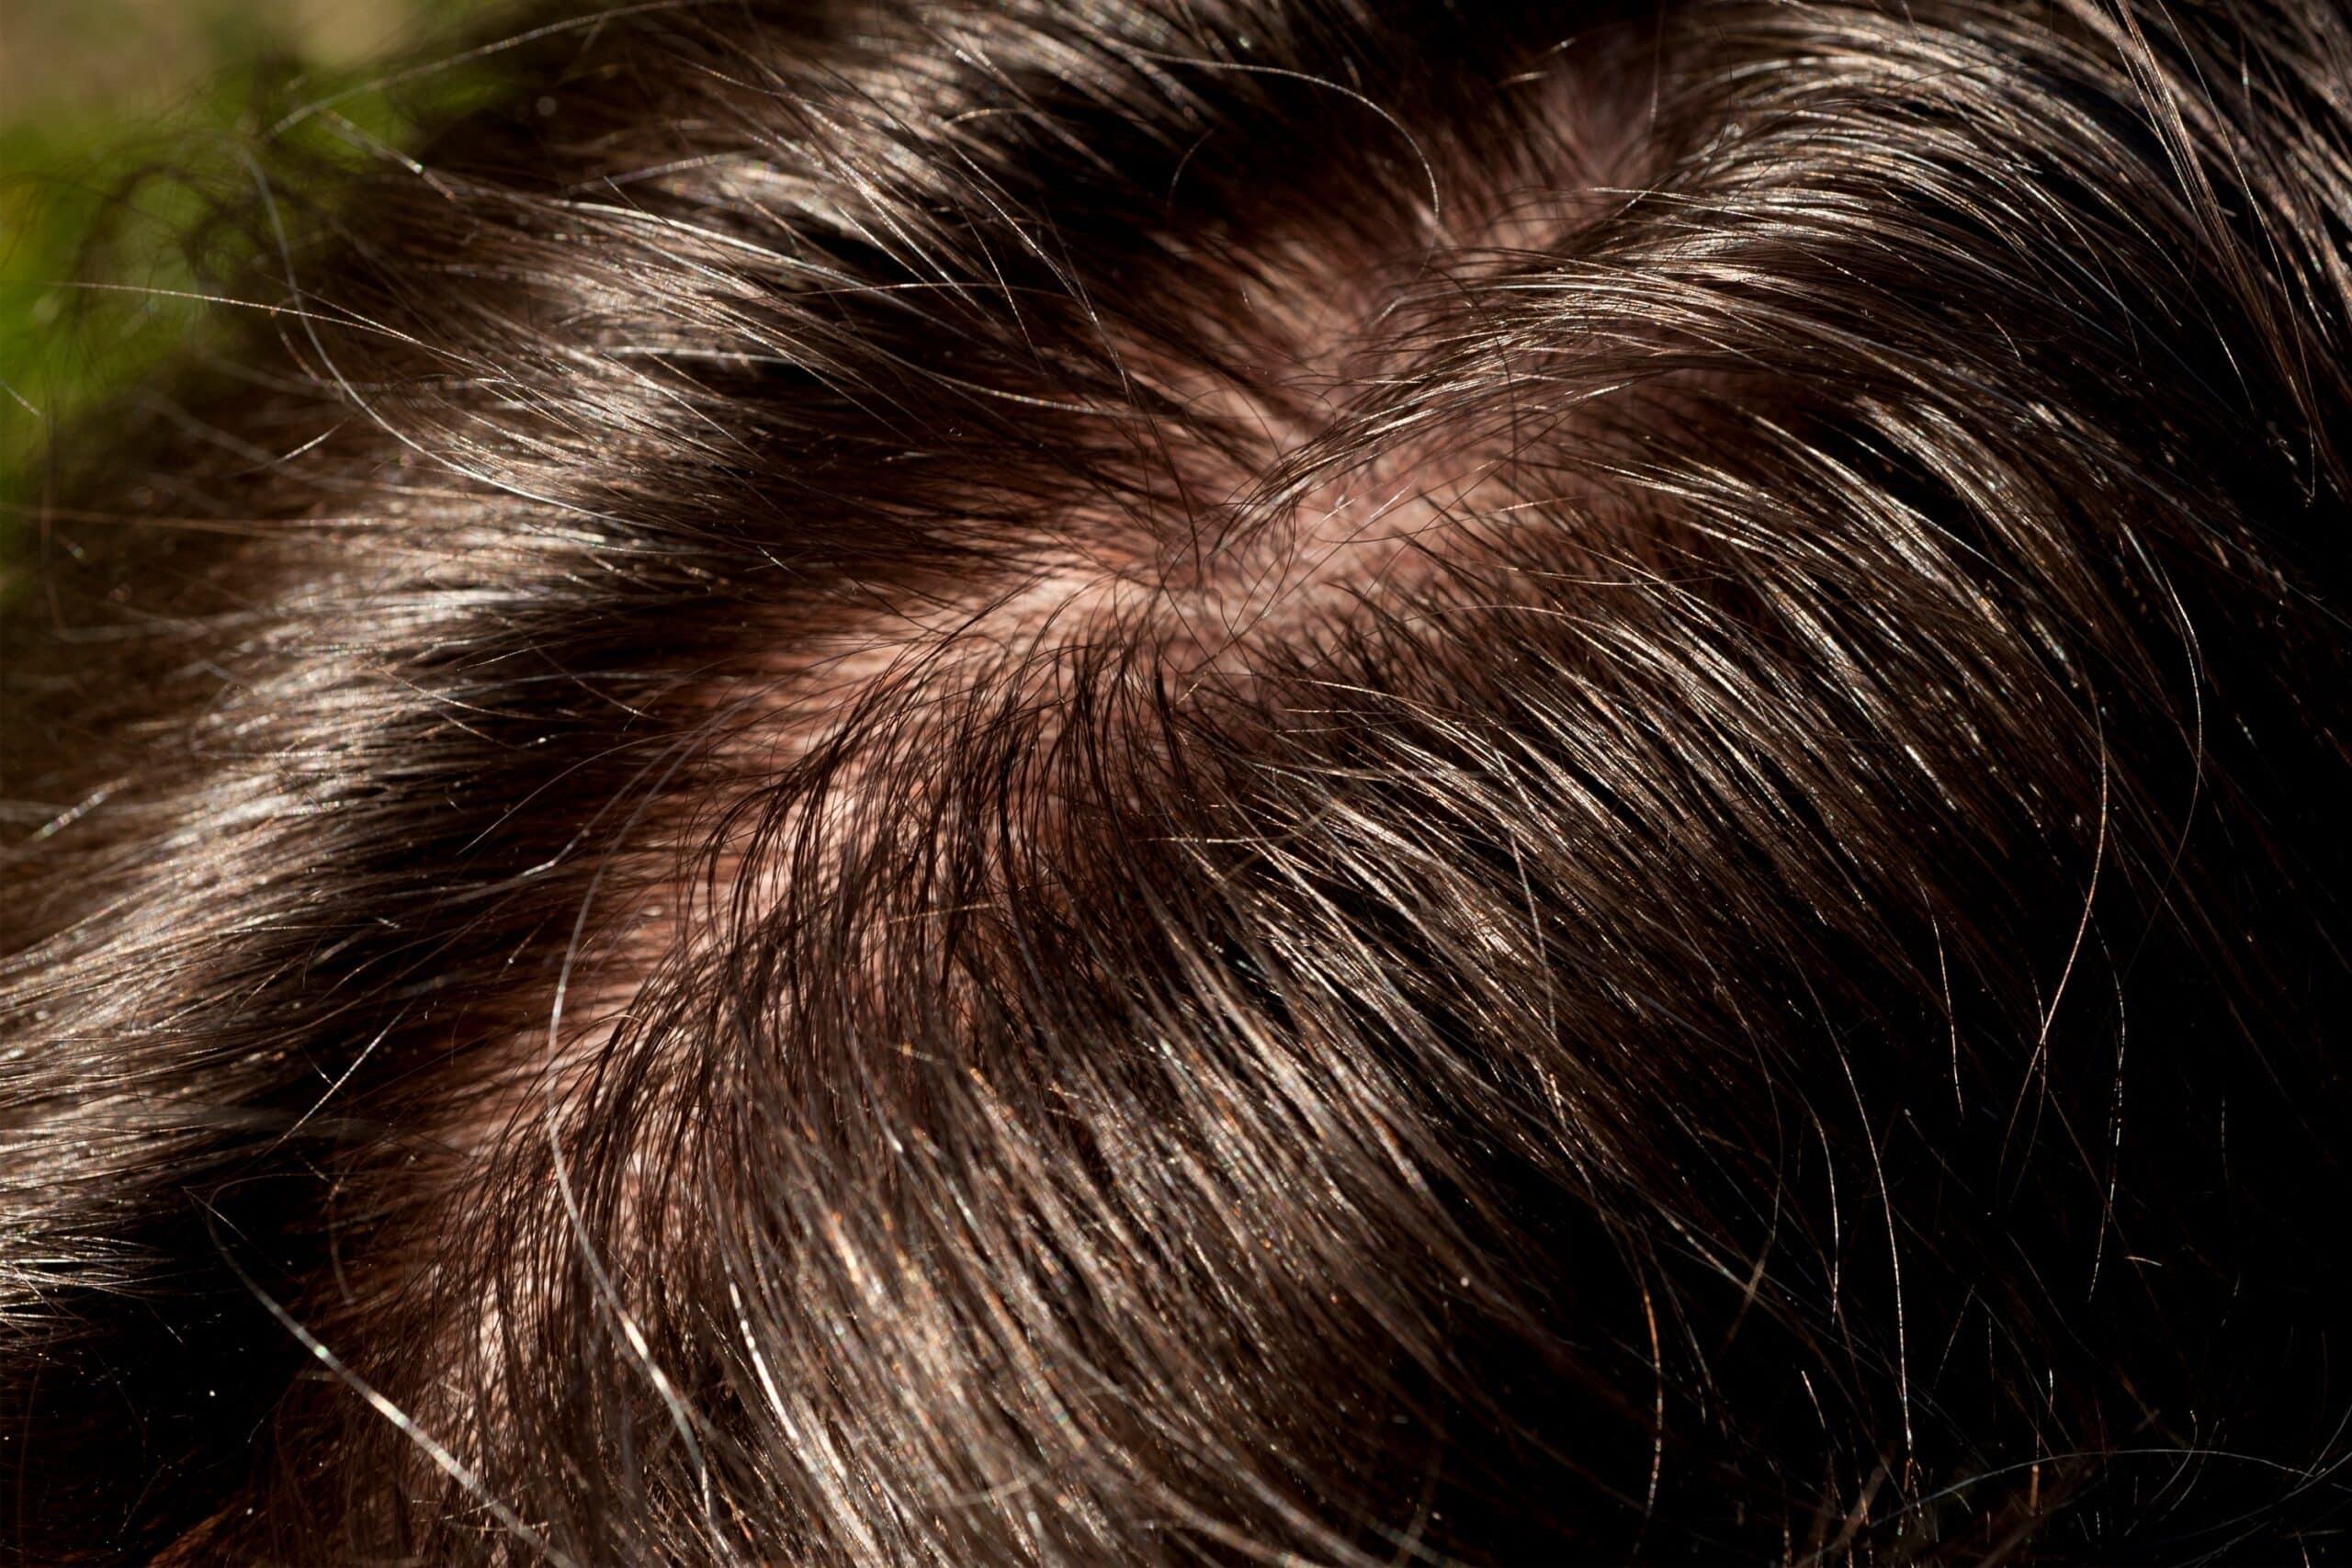 Hentikan-pemakaian-hair-mask-jika-rambut-menjadi-berminyak